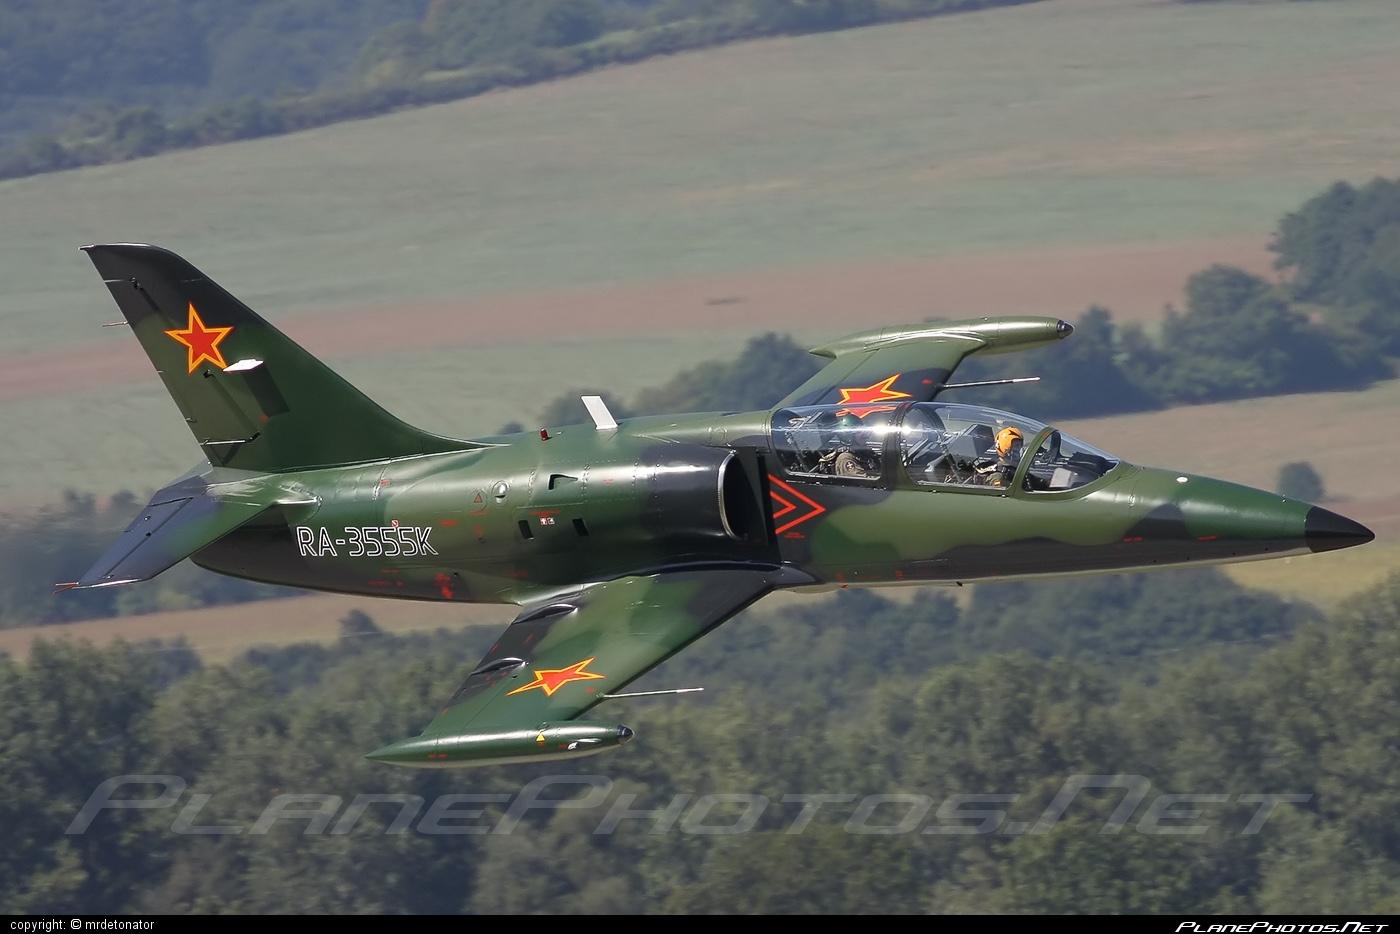 Aero L-39C Albatros - RA-3555K operated by Private operator #aero #aerol39 #aerol39albatros #aerol39calbatros #albatros #l39 #l39c #l39calbatros